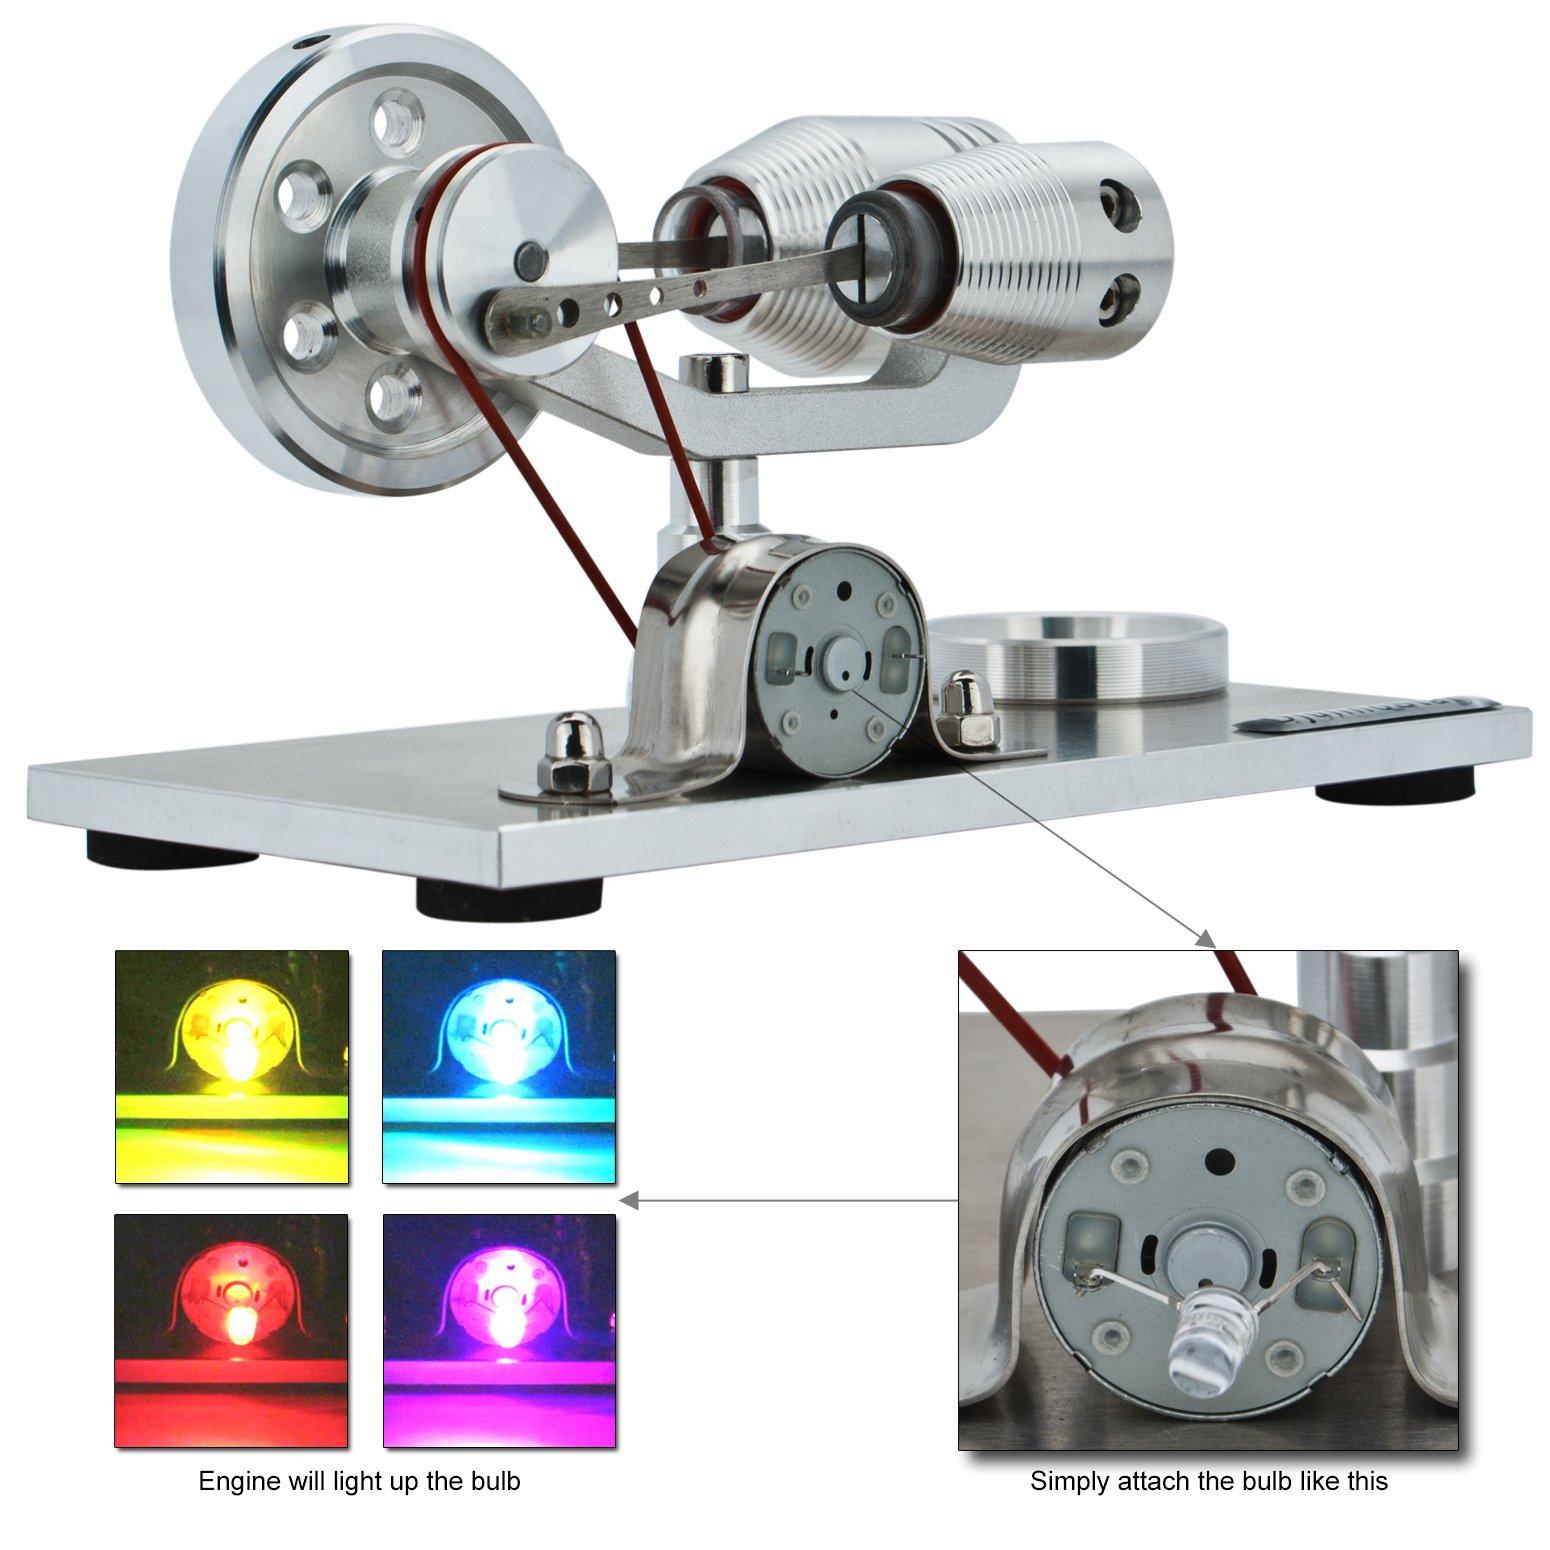 DjuiinoStar Hot Air Stirling Engine, Solid Metal Construction, Electricity Generator(Assembled), My First Stirling Engine by DjuiinoStar (Image #4)